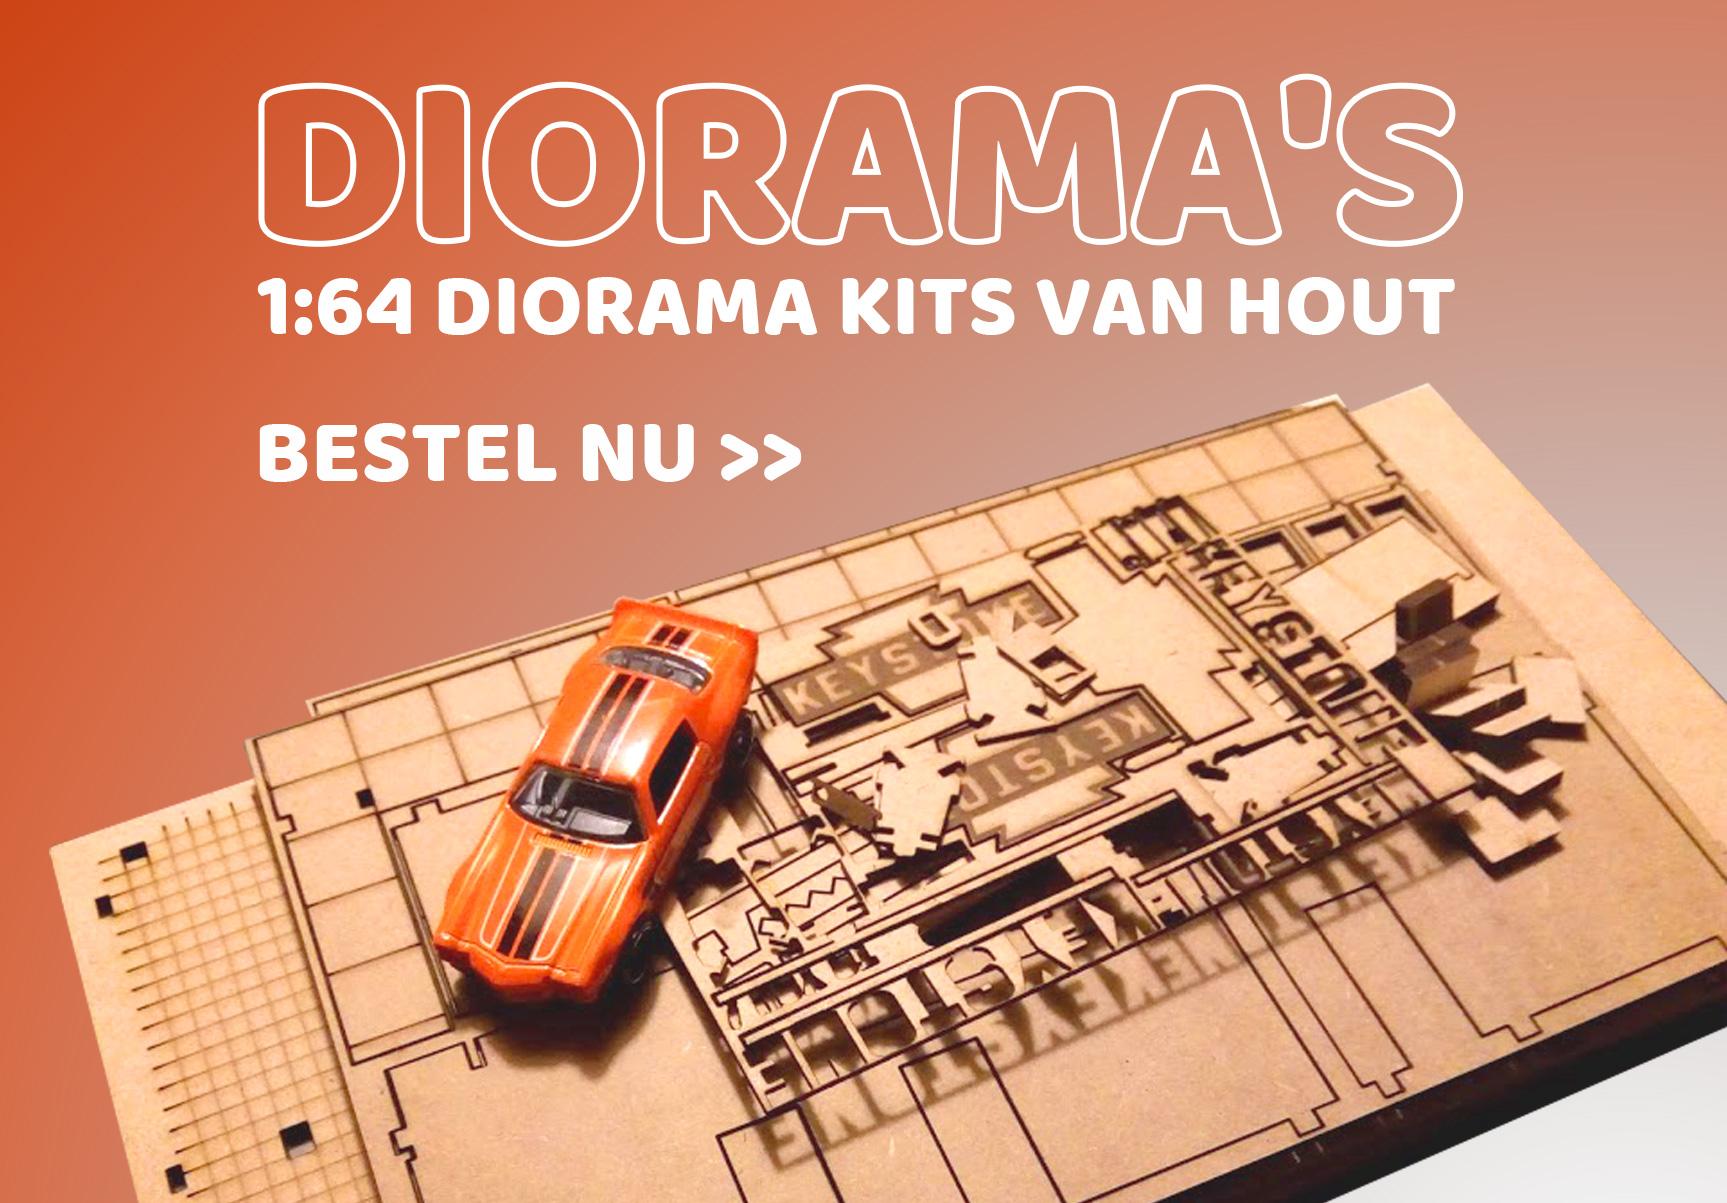 dio-kits-home-banner-50